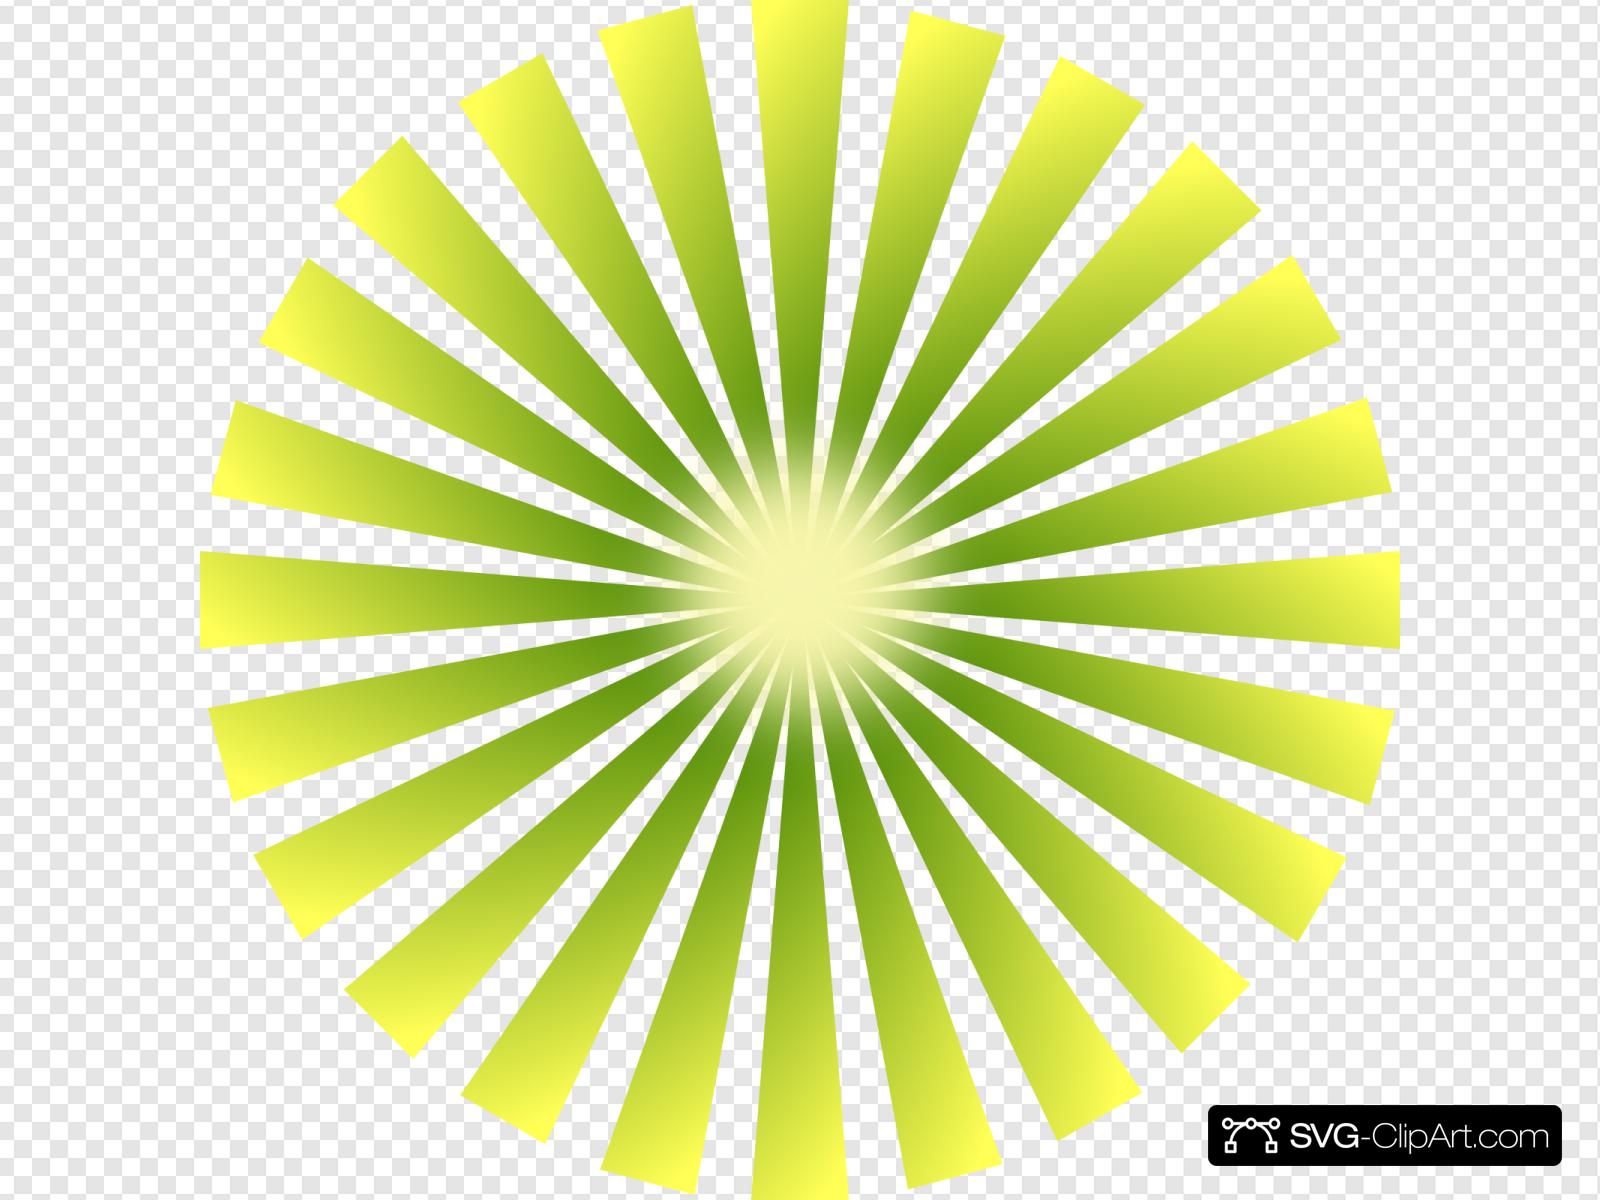 Rays clip art icon. Burst clipart green